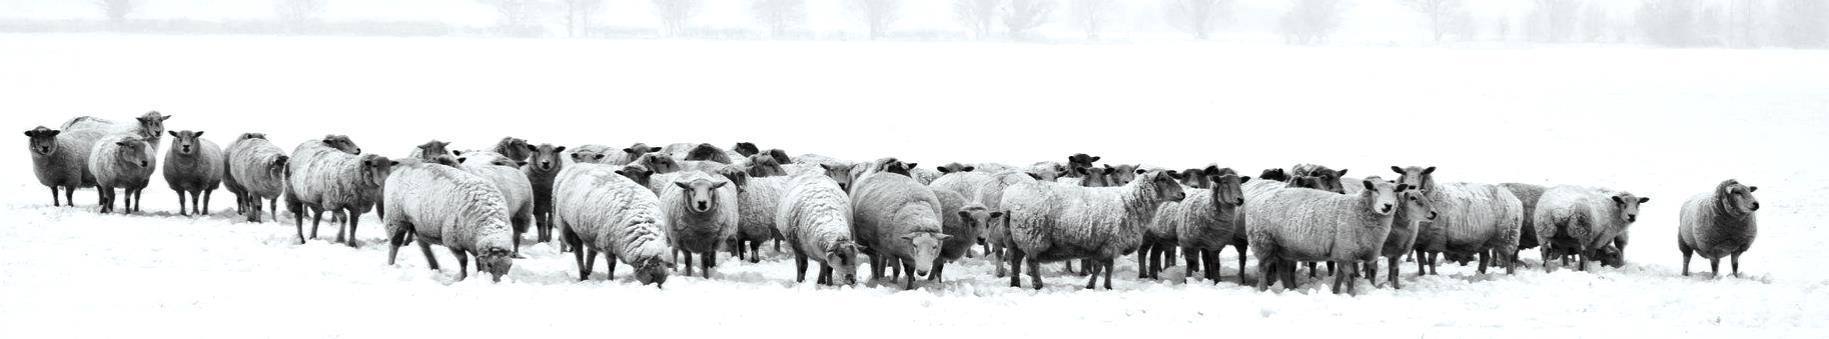 Sheep winter